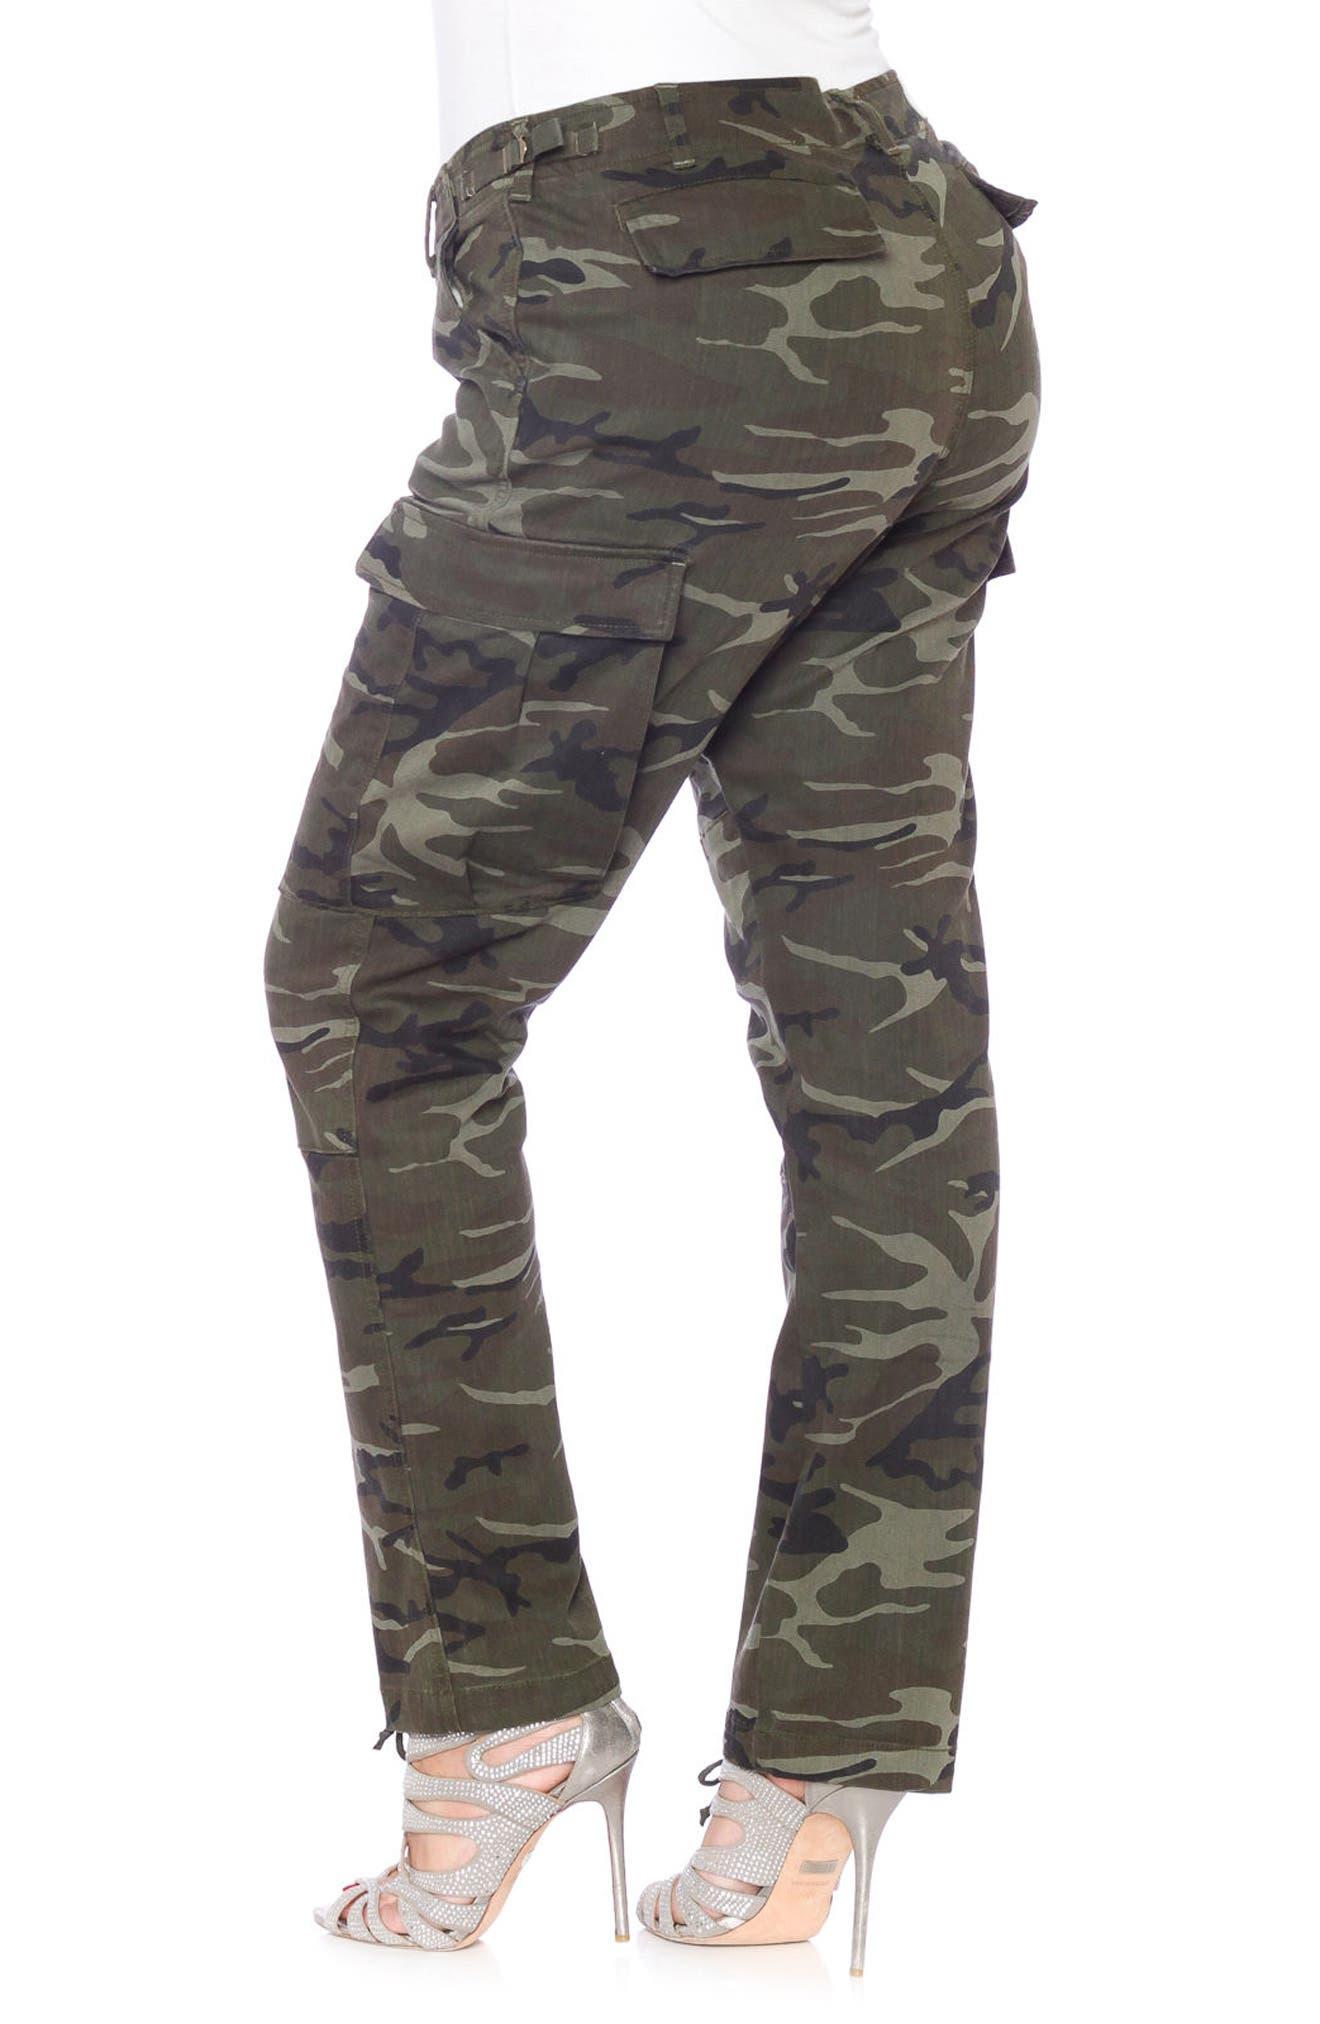 Camo Twill Cargo Pants,                             Alternate thumbnail 3, color,                             Olive Camo